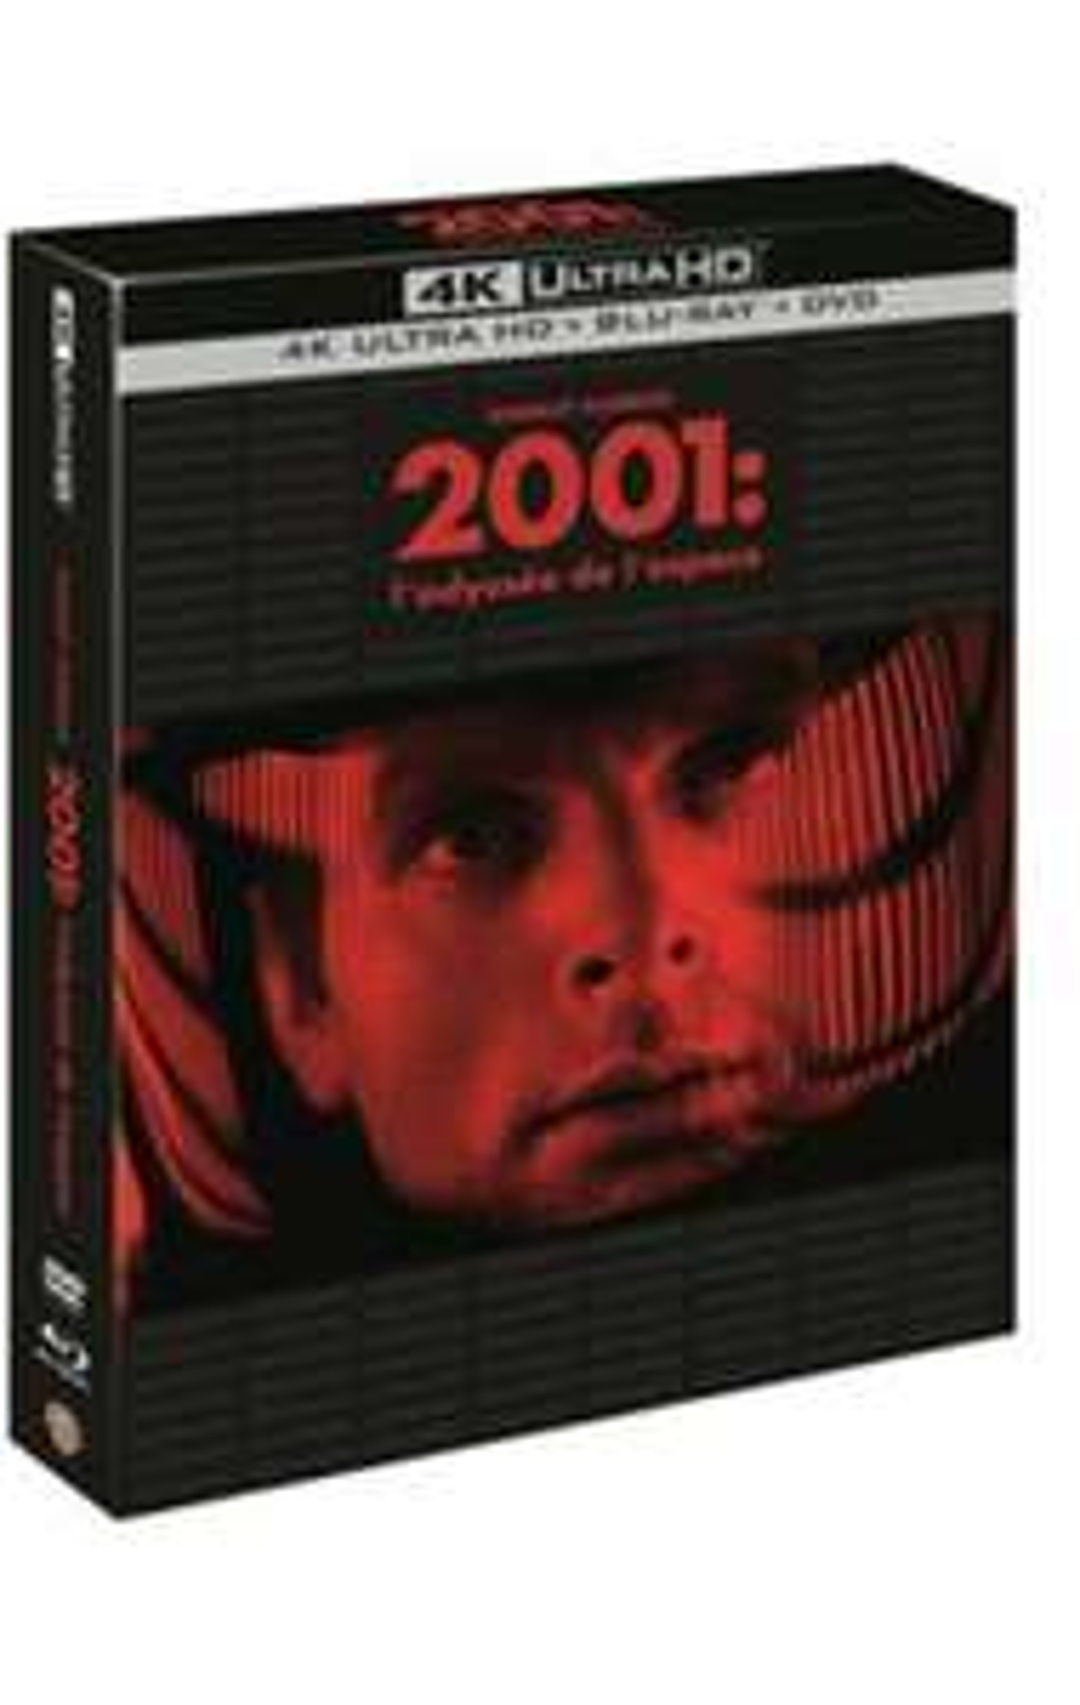 Blu-ray 4K UHD : 2001 l'Odyssée de l'espace